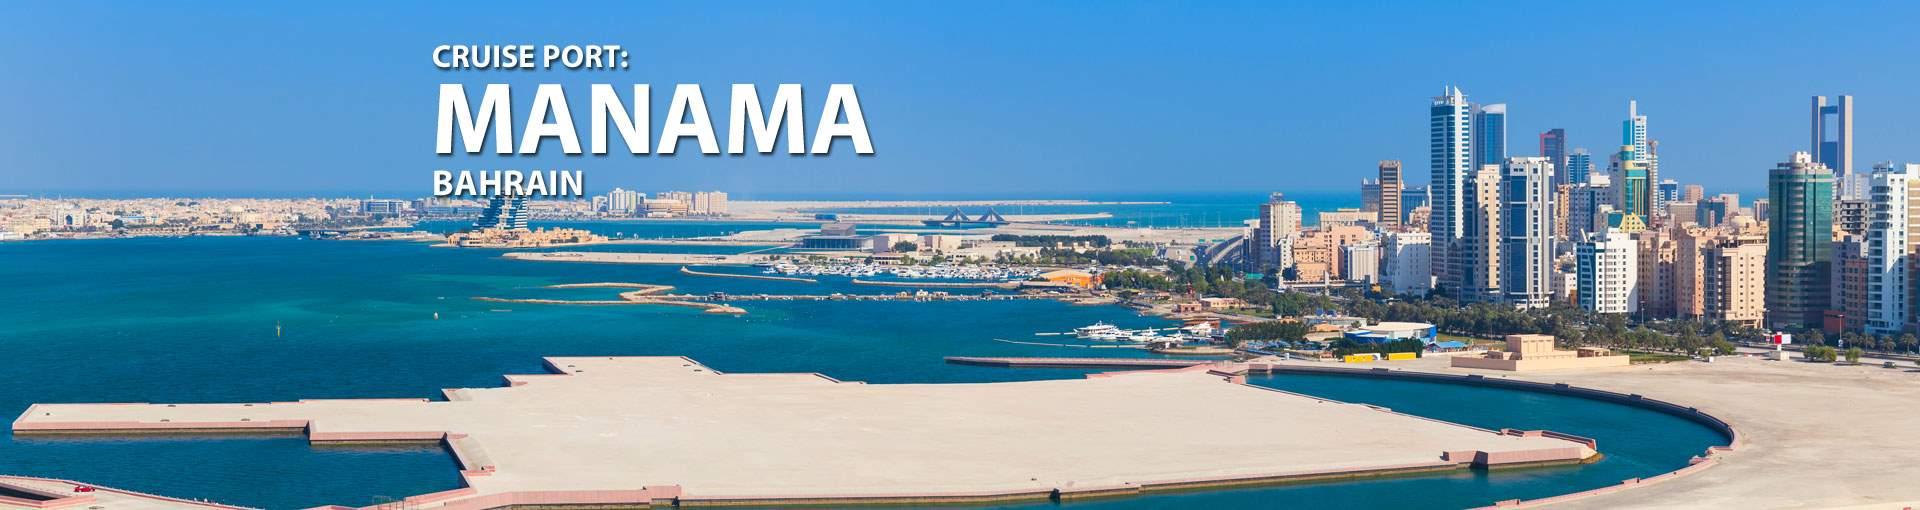 manama bahrain cruise port 2018 and 2019 cruises to